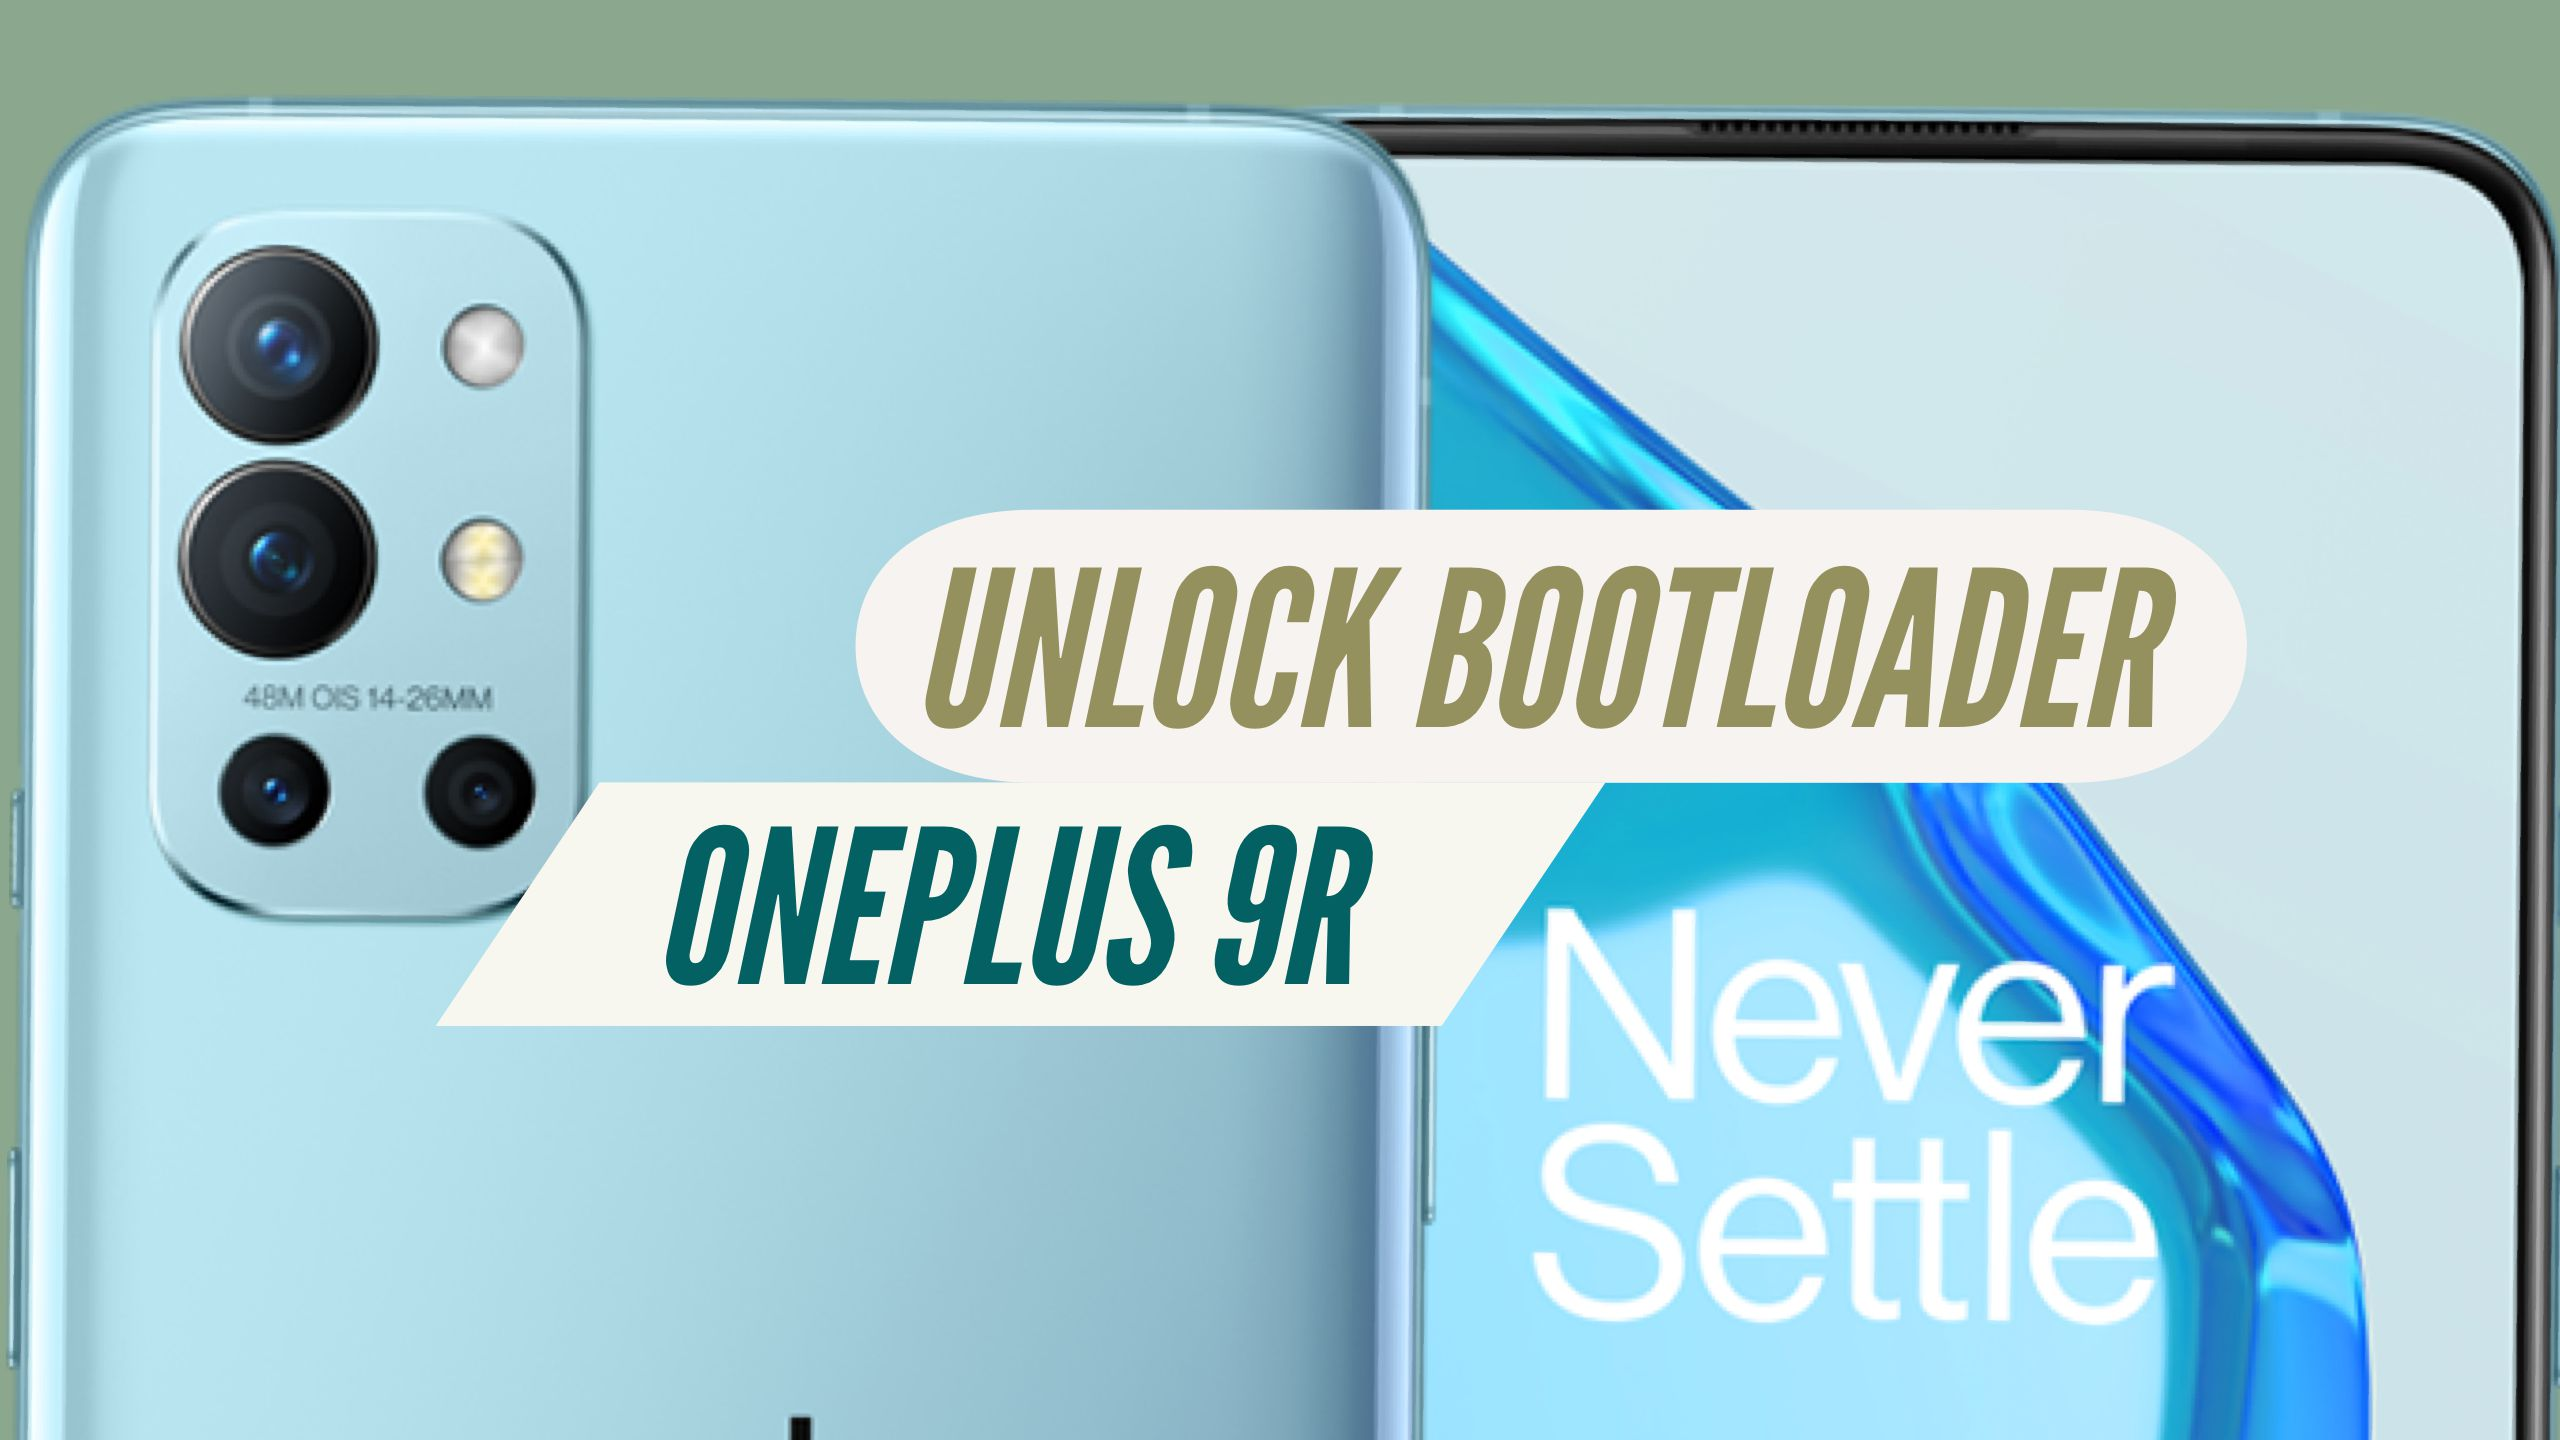 Unlock Bootloader OnePlus 9R